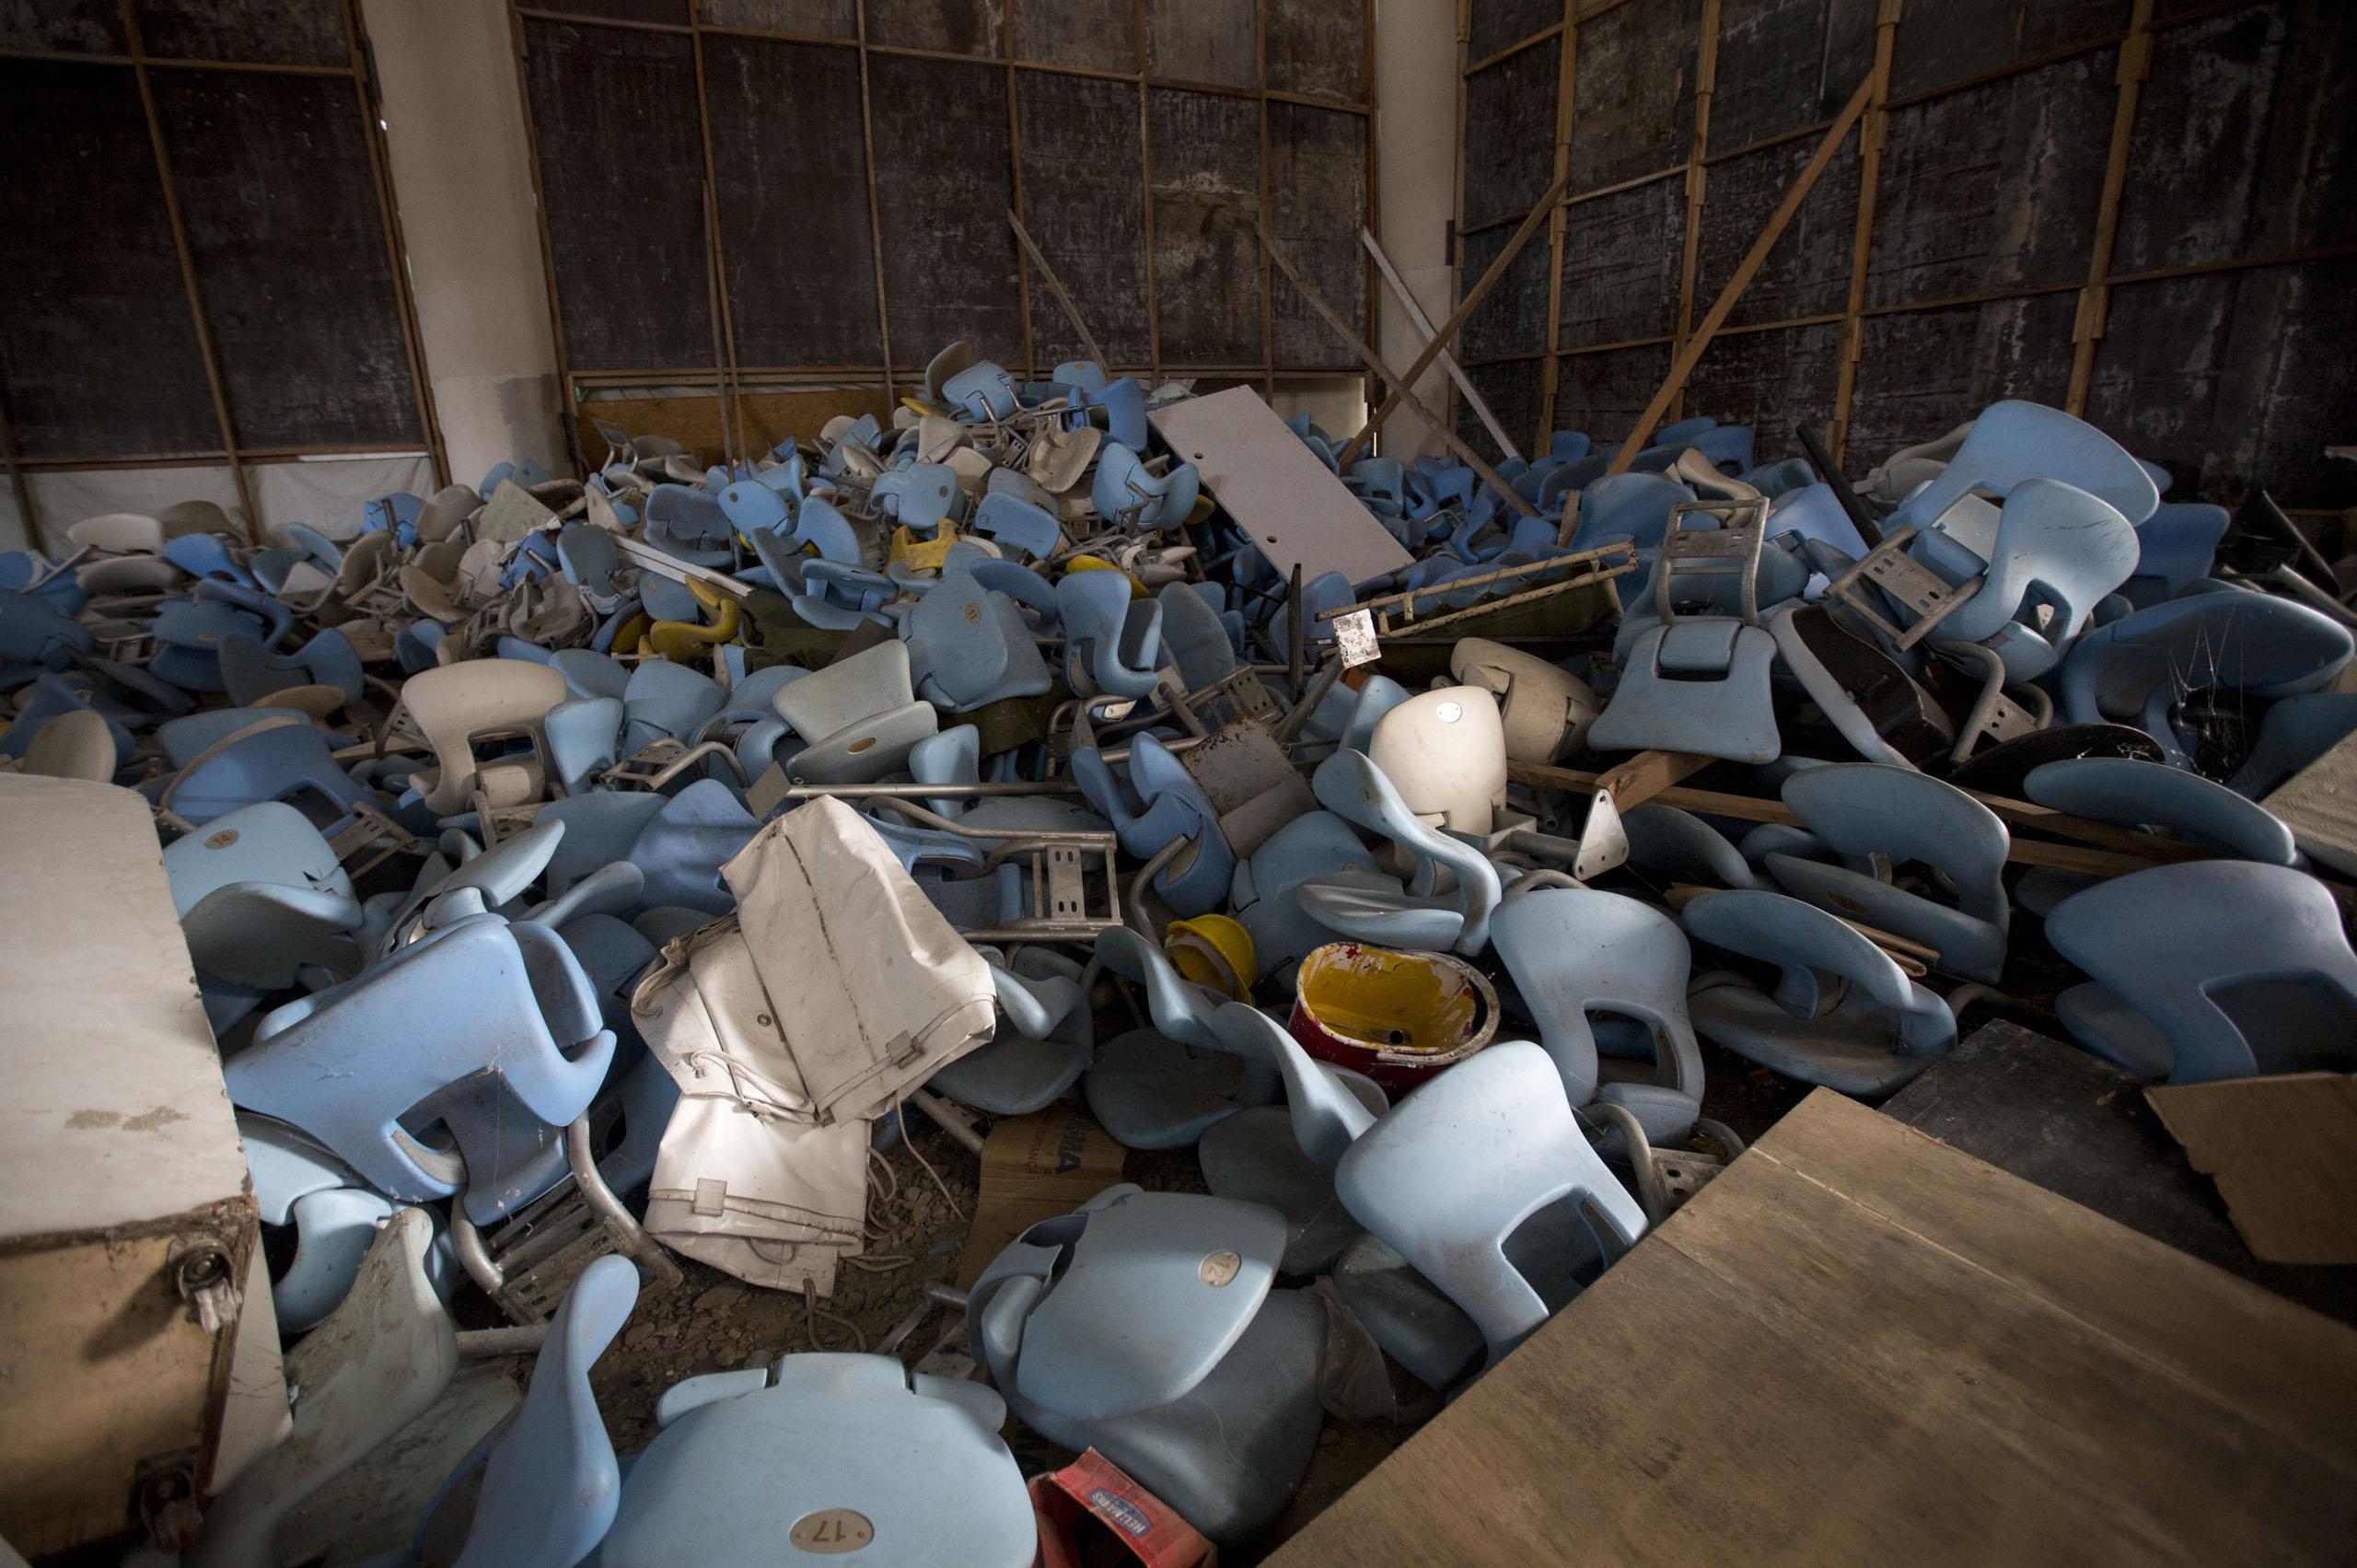 Seats jumbled in a pile inside Maracana stadium in Rio de Janeiro, Brazil on Feb. 2, 2017.